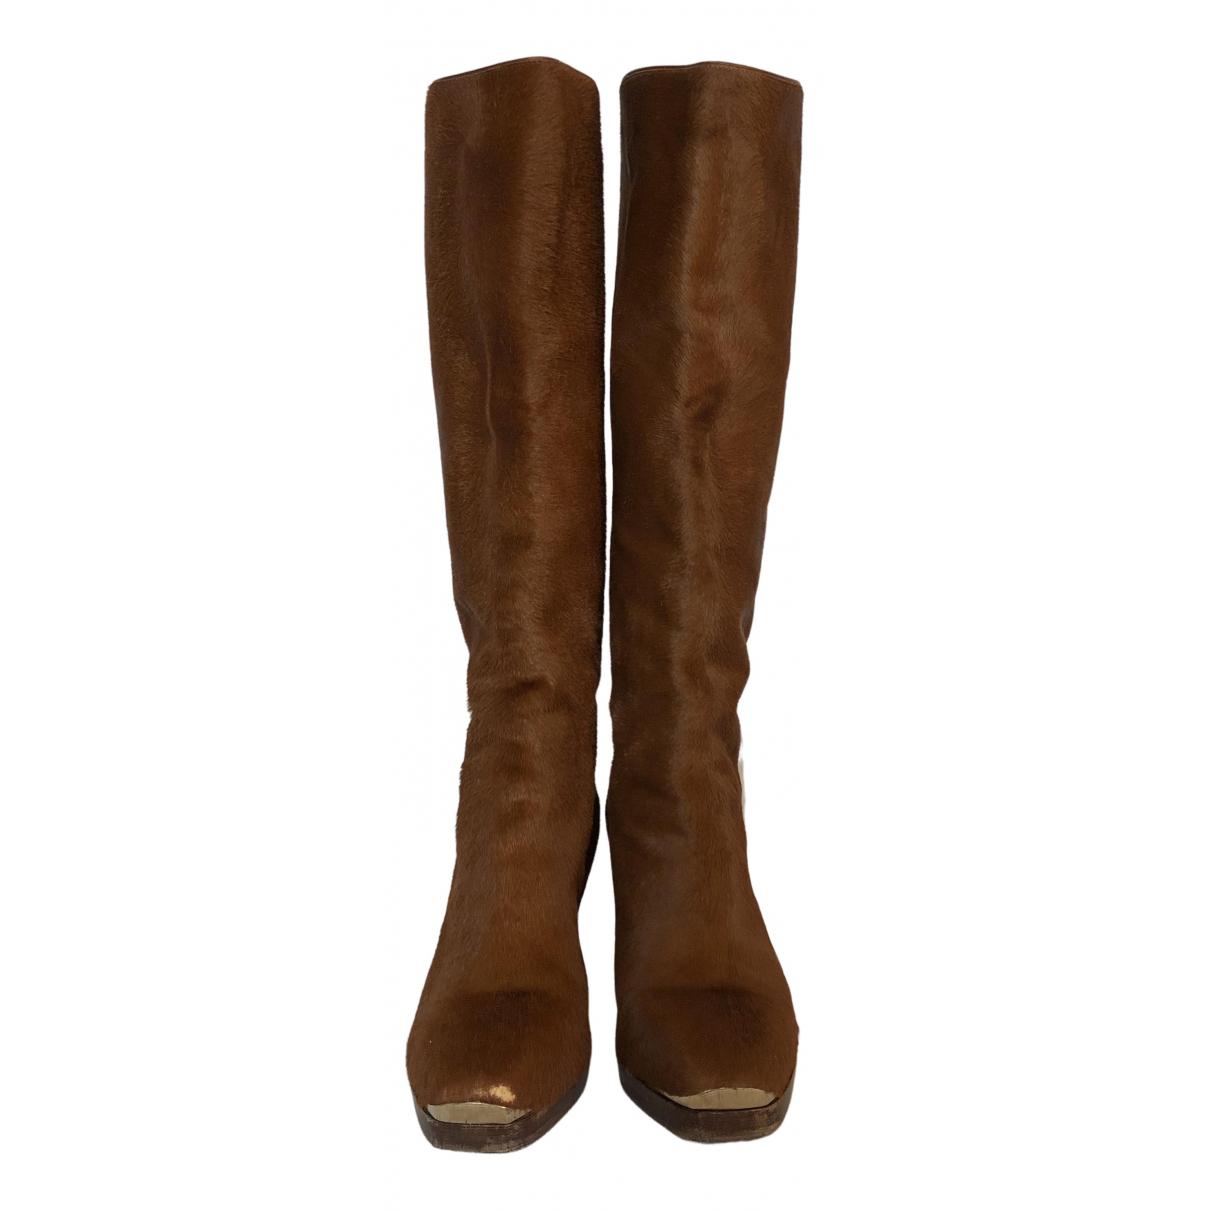 Trussardi N Camel Pony-style calfskin Boots for Women 36 IT